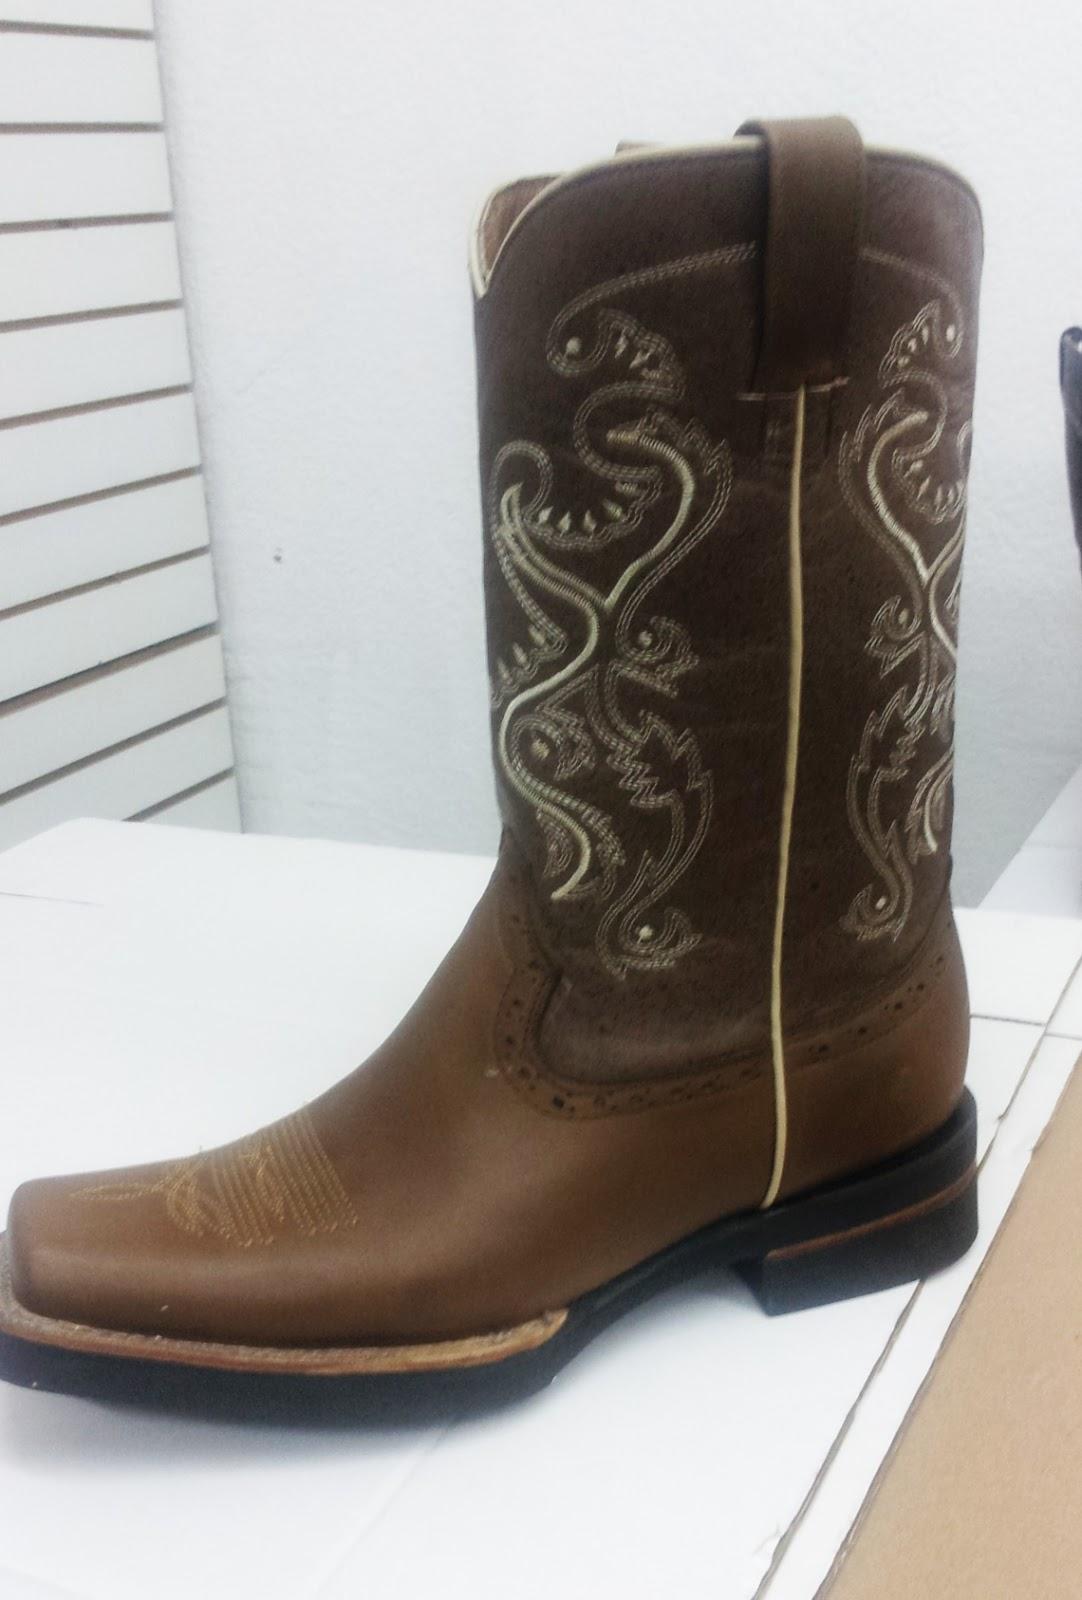 094fa4a4b botas vaqueras hombre punta cuadrada